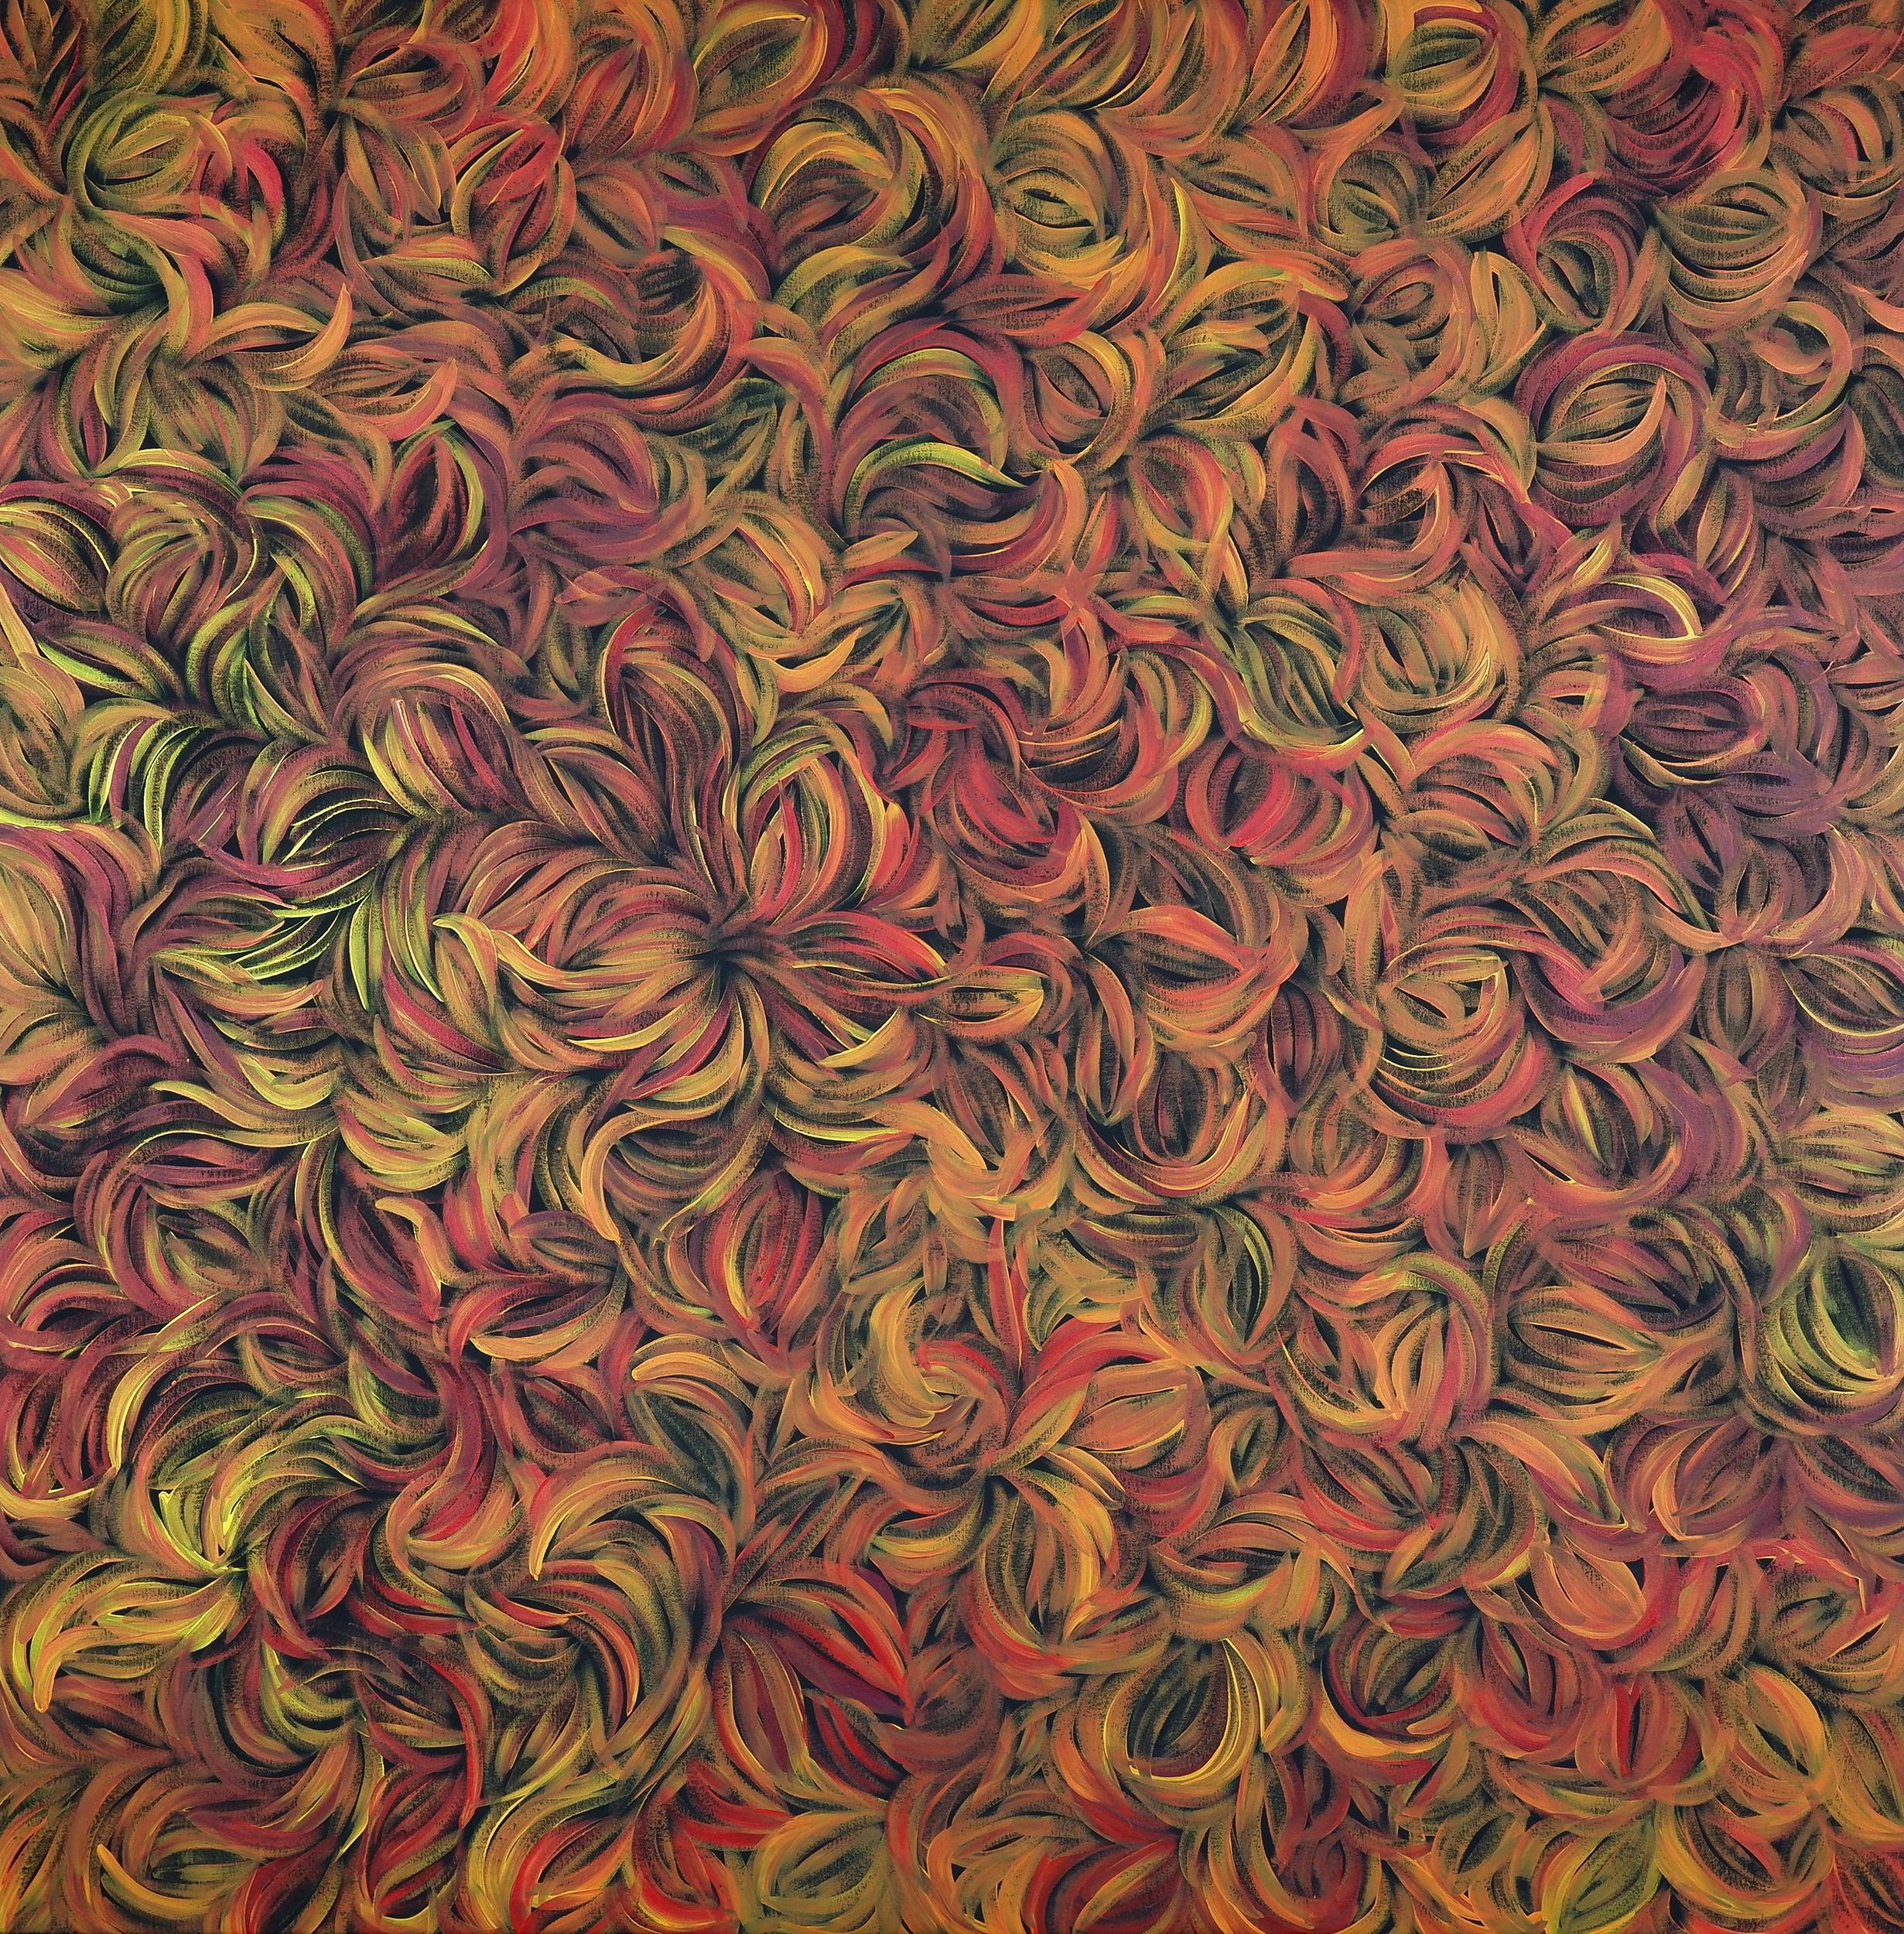 'Margaret Scobie (born 1948, Anmatyerre language group), Bush Leaf Medicine, Synthetic Polymer Paint on Canvas'